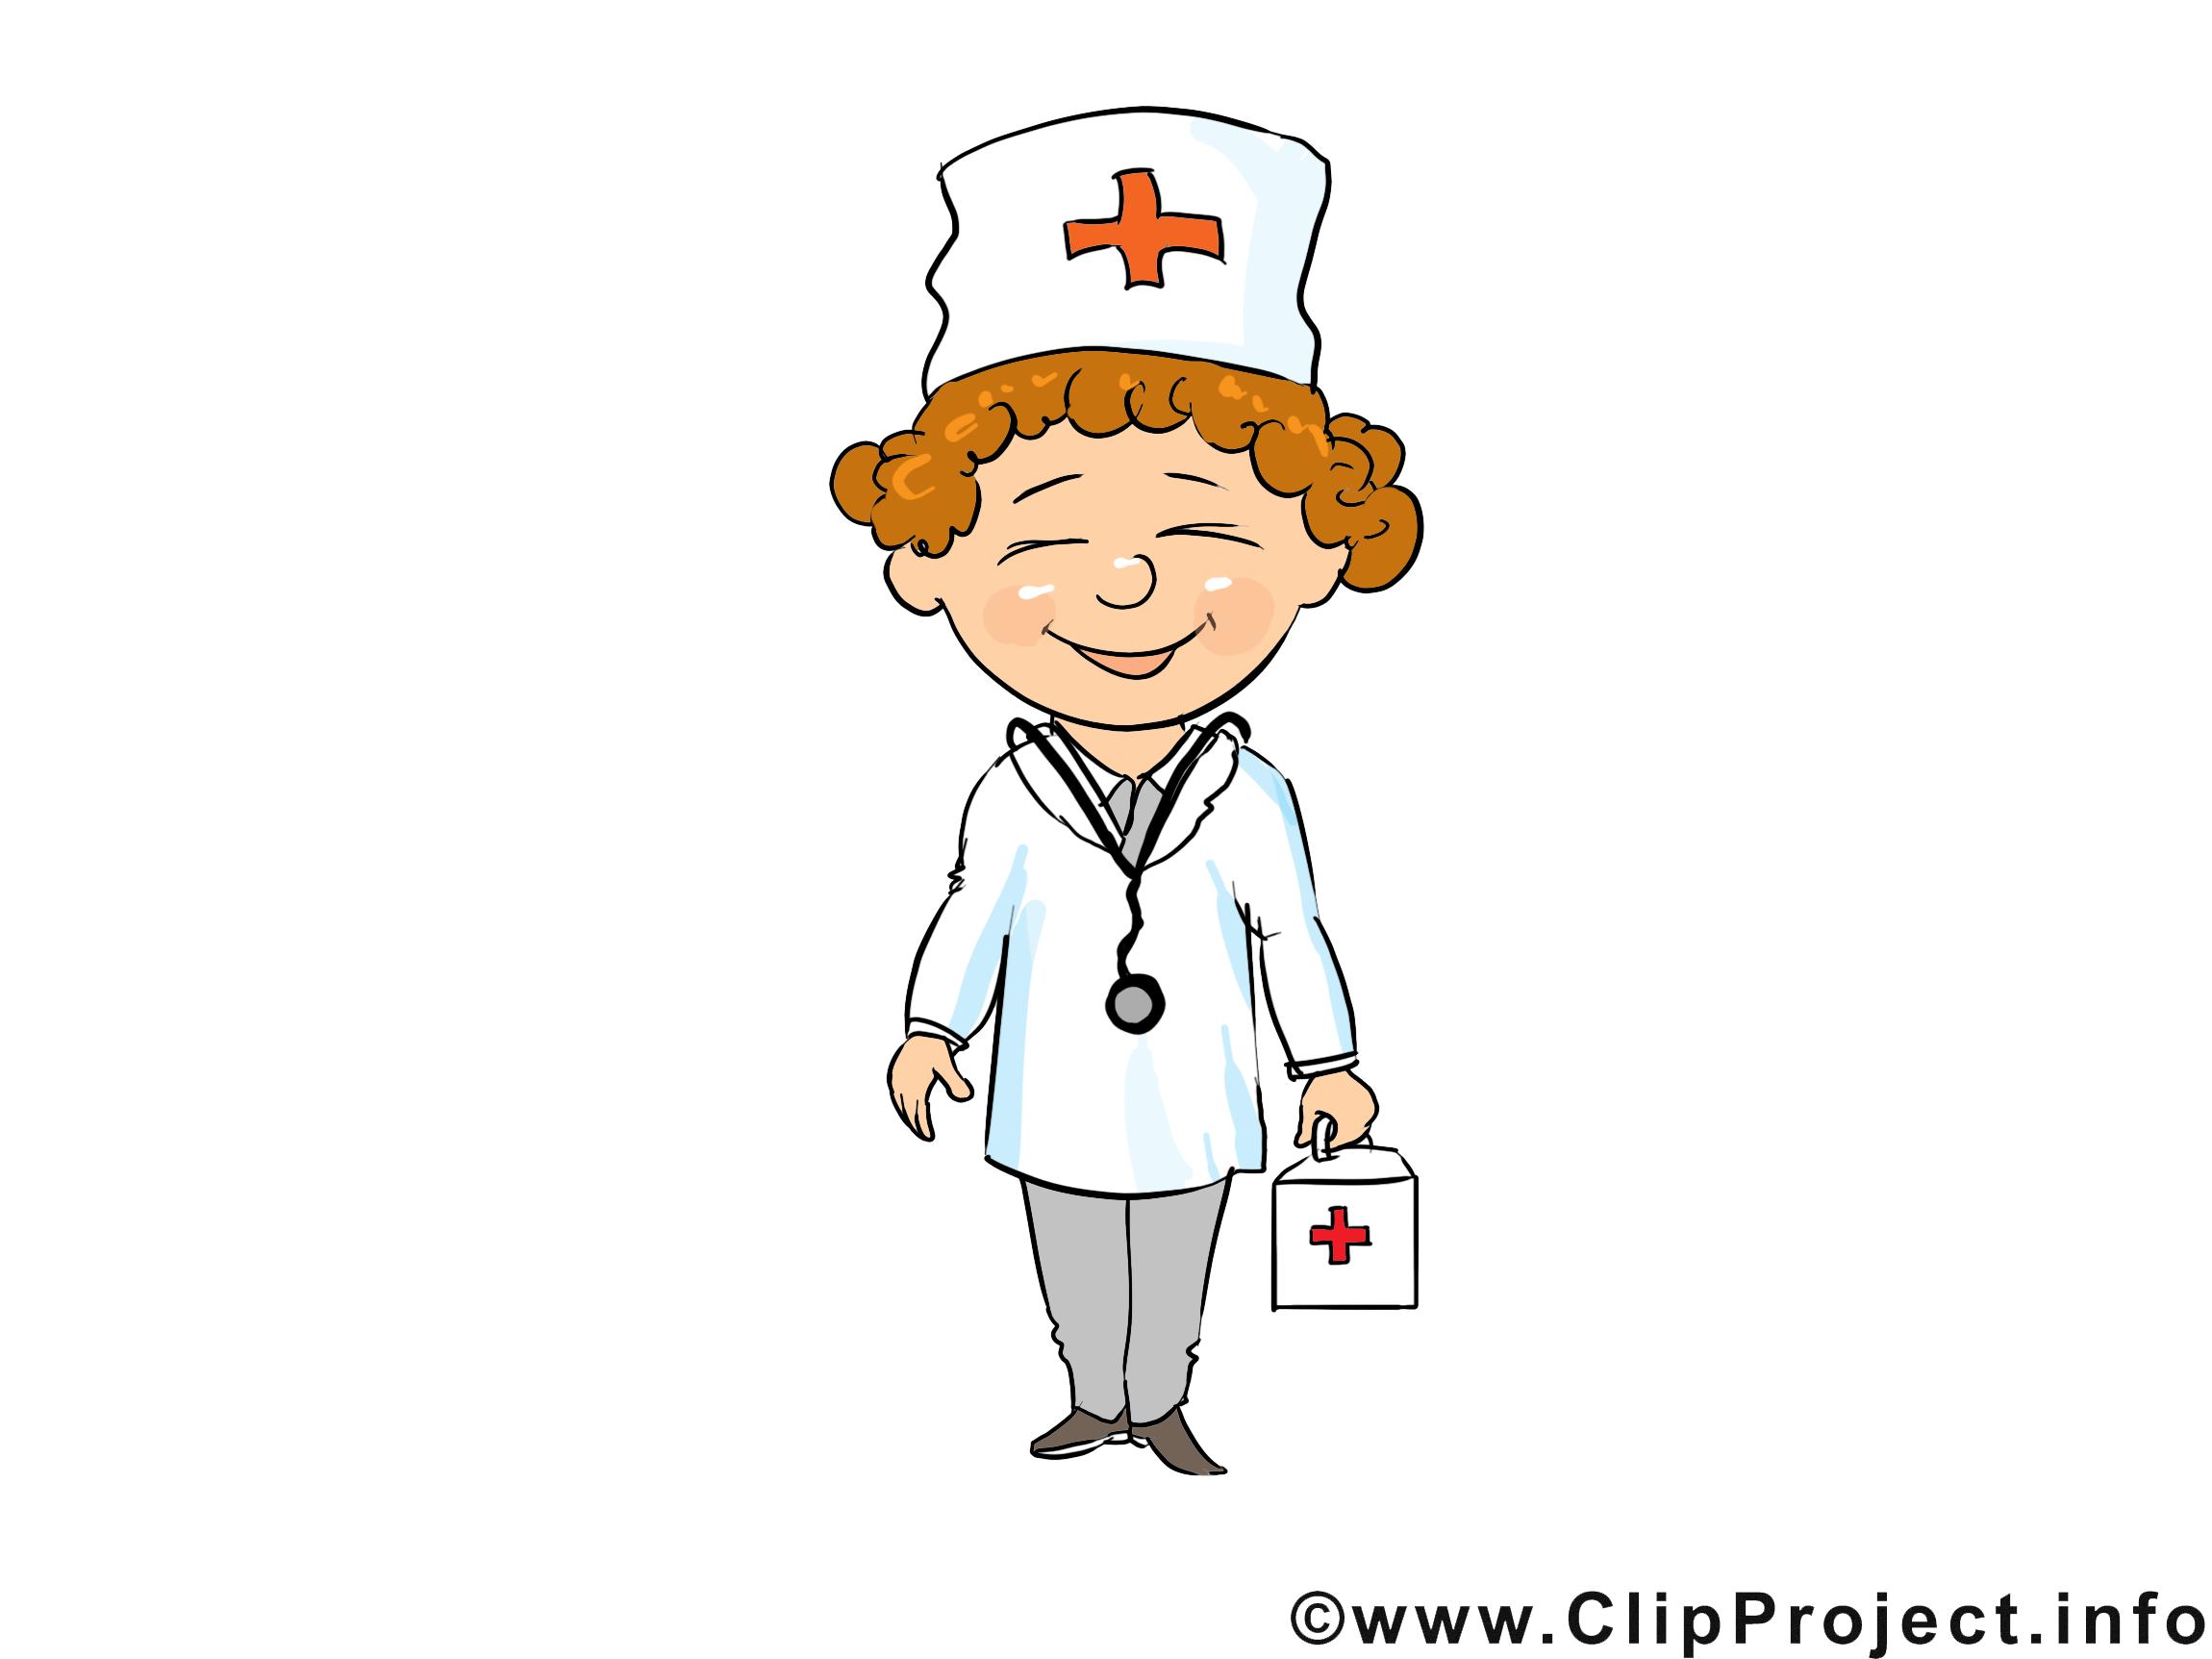 Médecin dessin gratuit - Métier clip arts gratuits